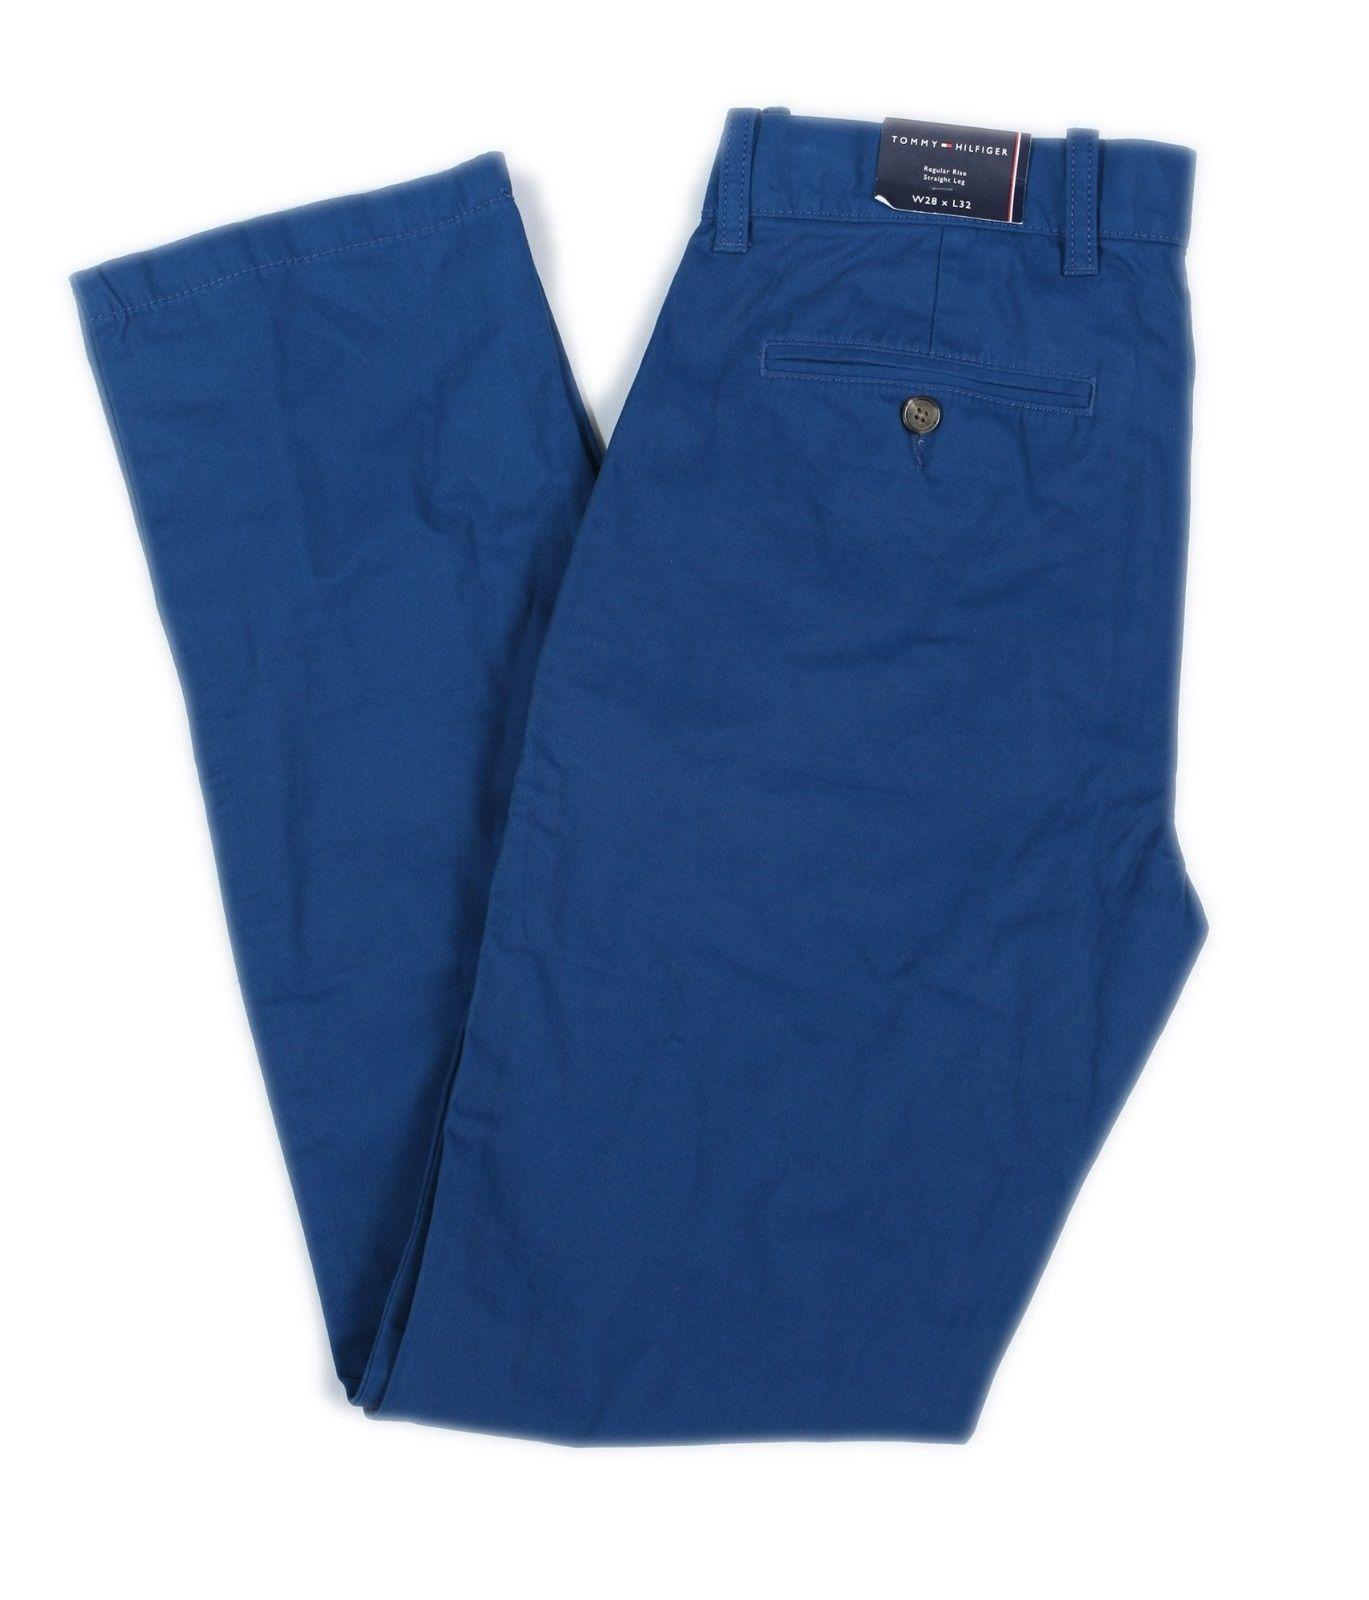 87f83fa3 NWT Tommy Hilfiger Men's Pant Regular Rise and 41 similar items